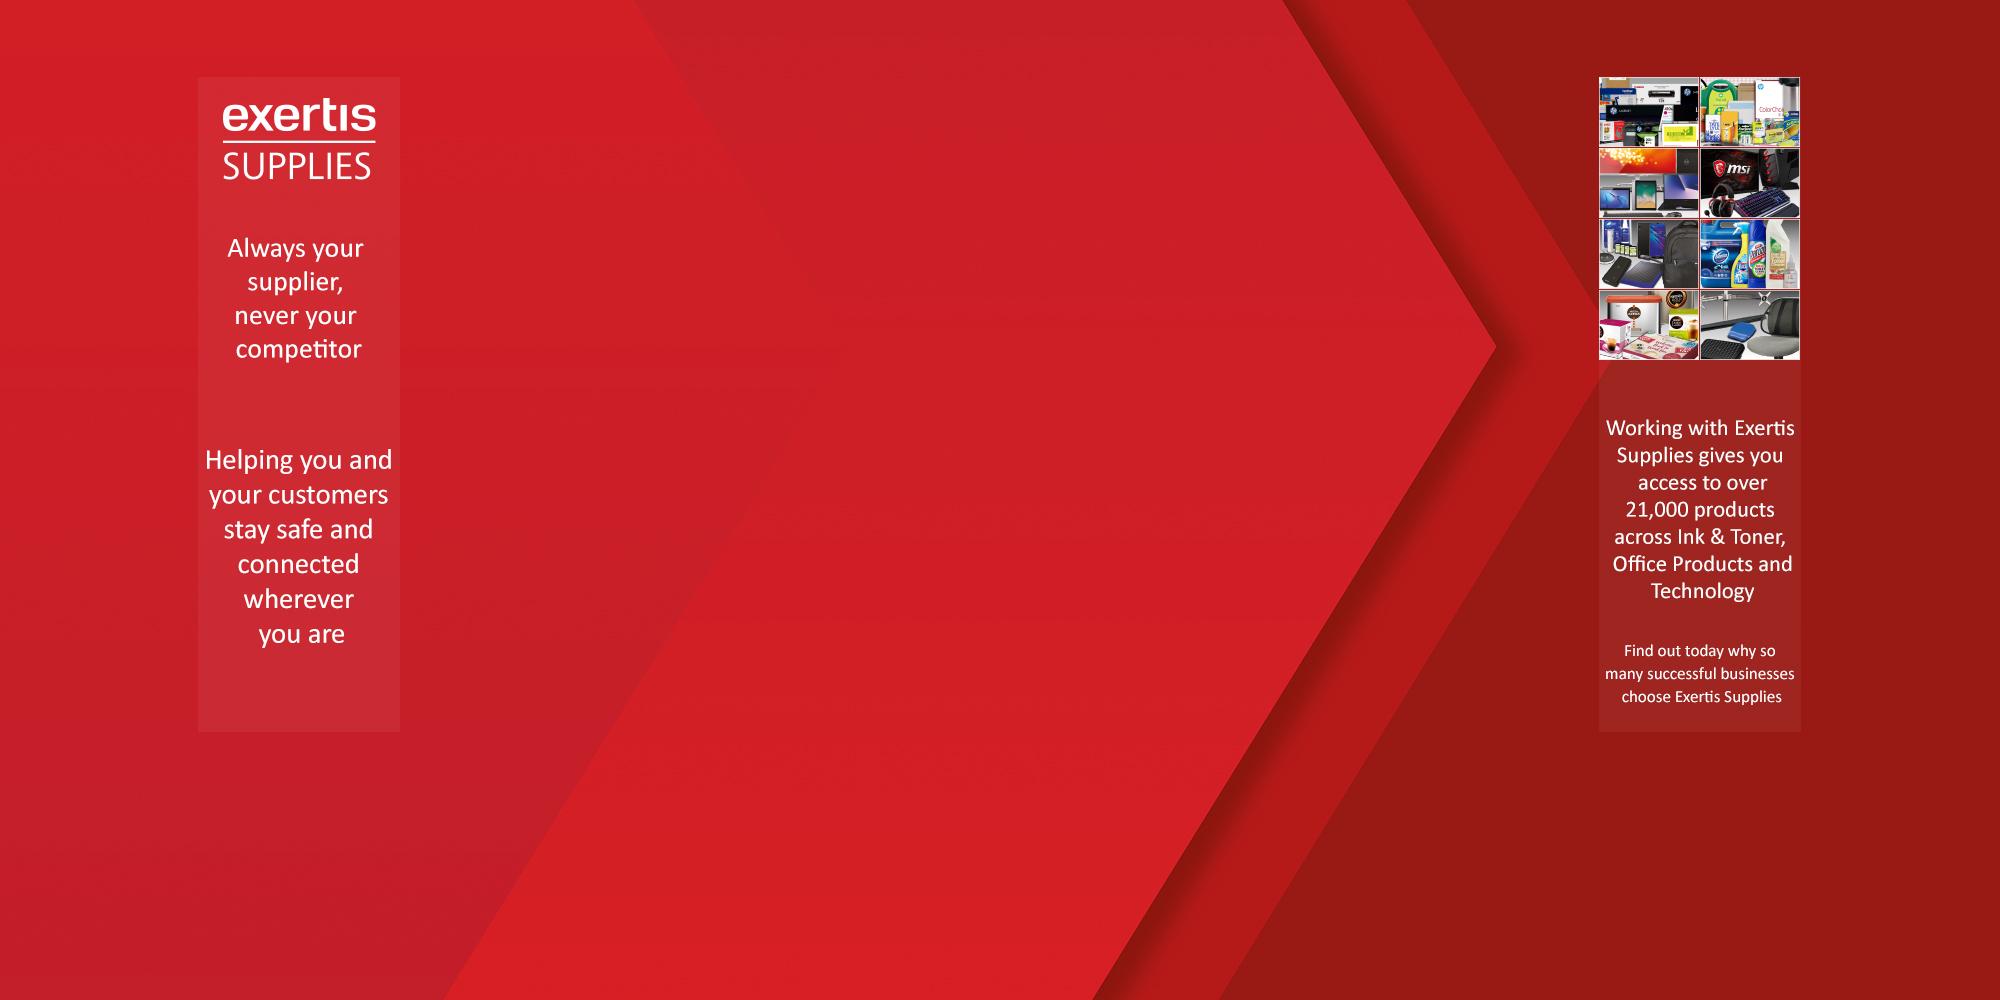 Exertis_Supplies_Site_banners